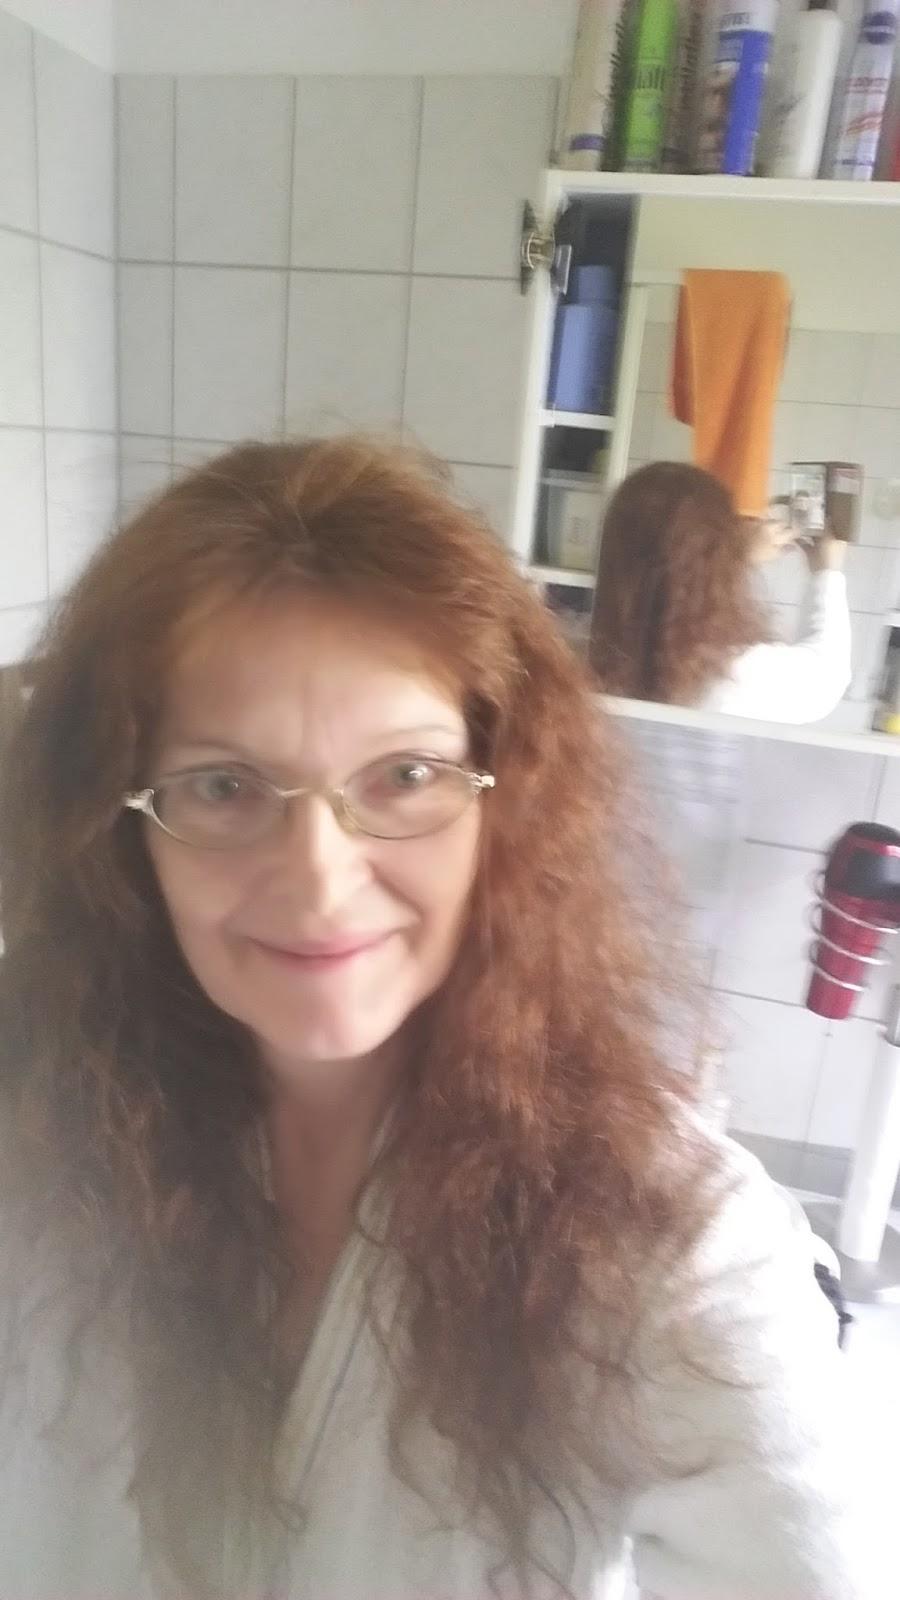 Dunkelblond color erfahrung expert Haarfärbemittel Test